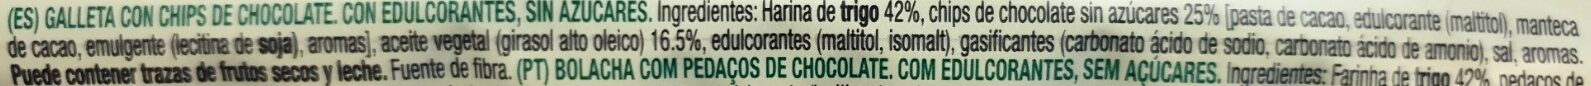 Diet Nature chip choco sin azúcares - Produto - pt